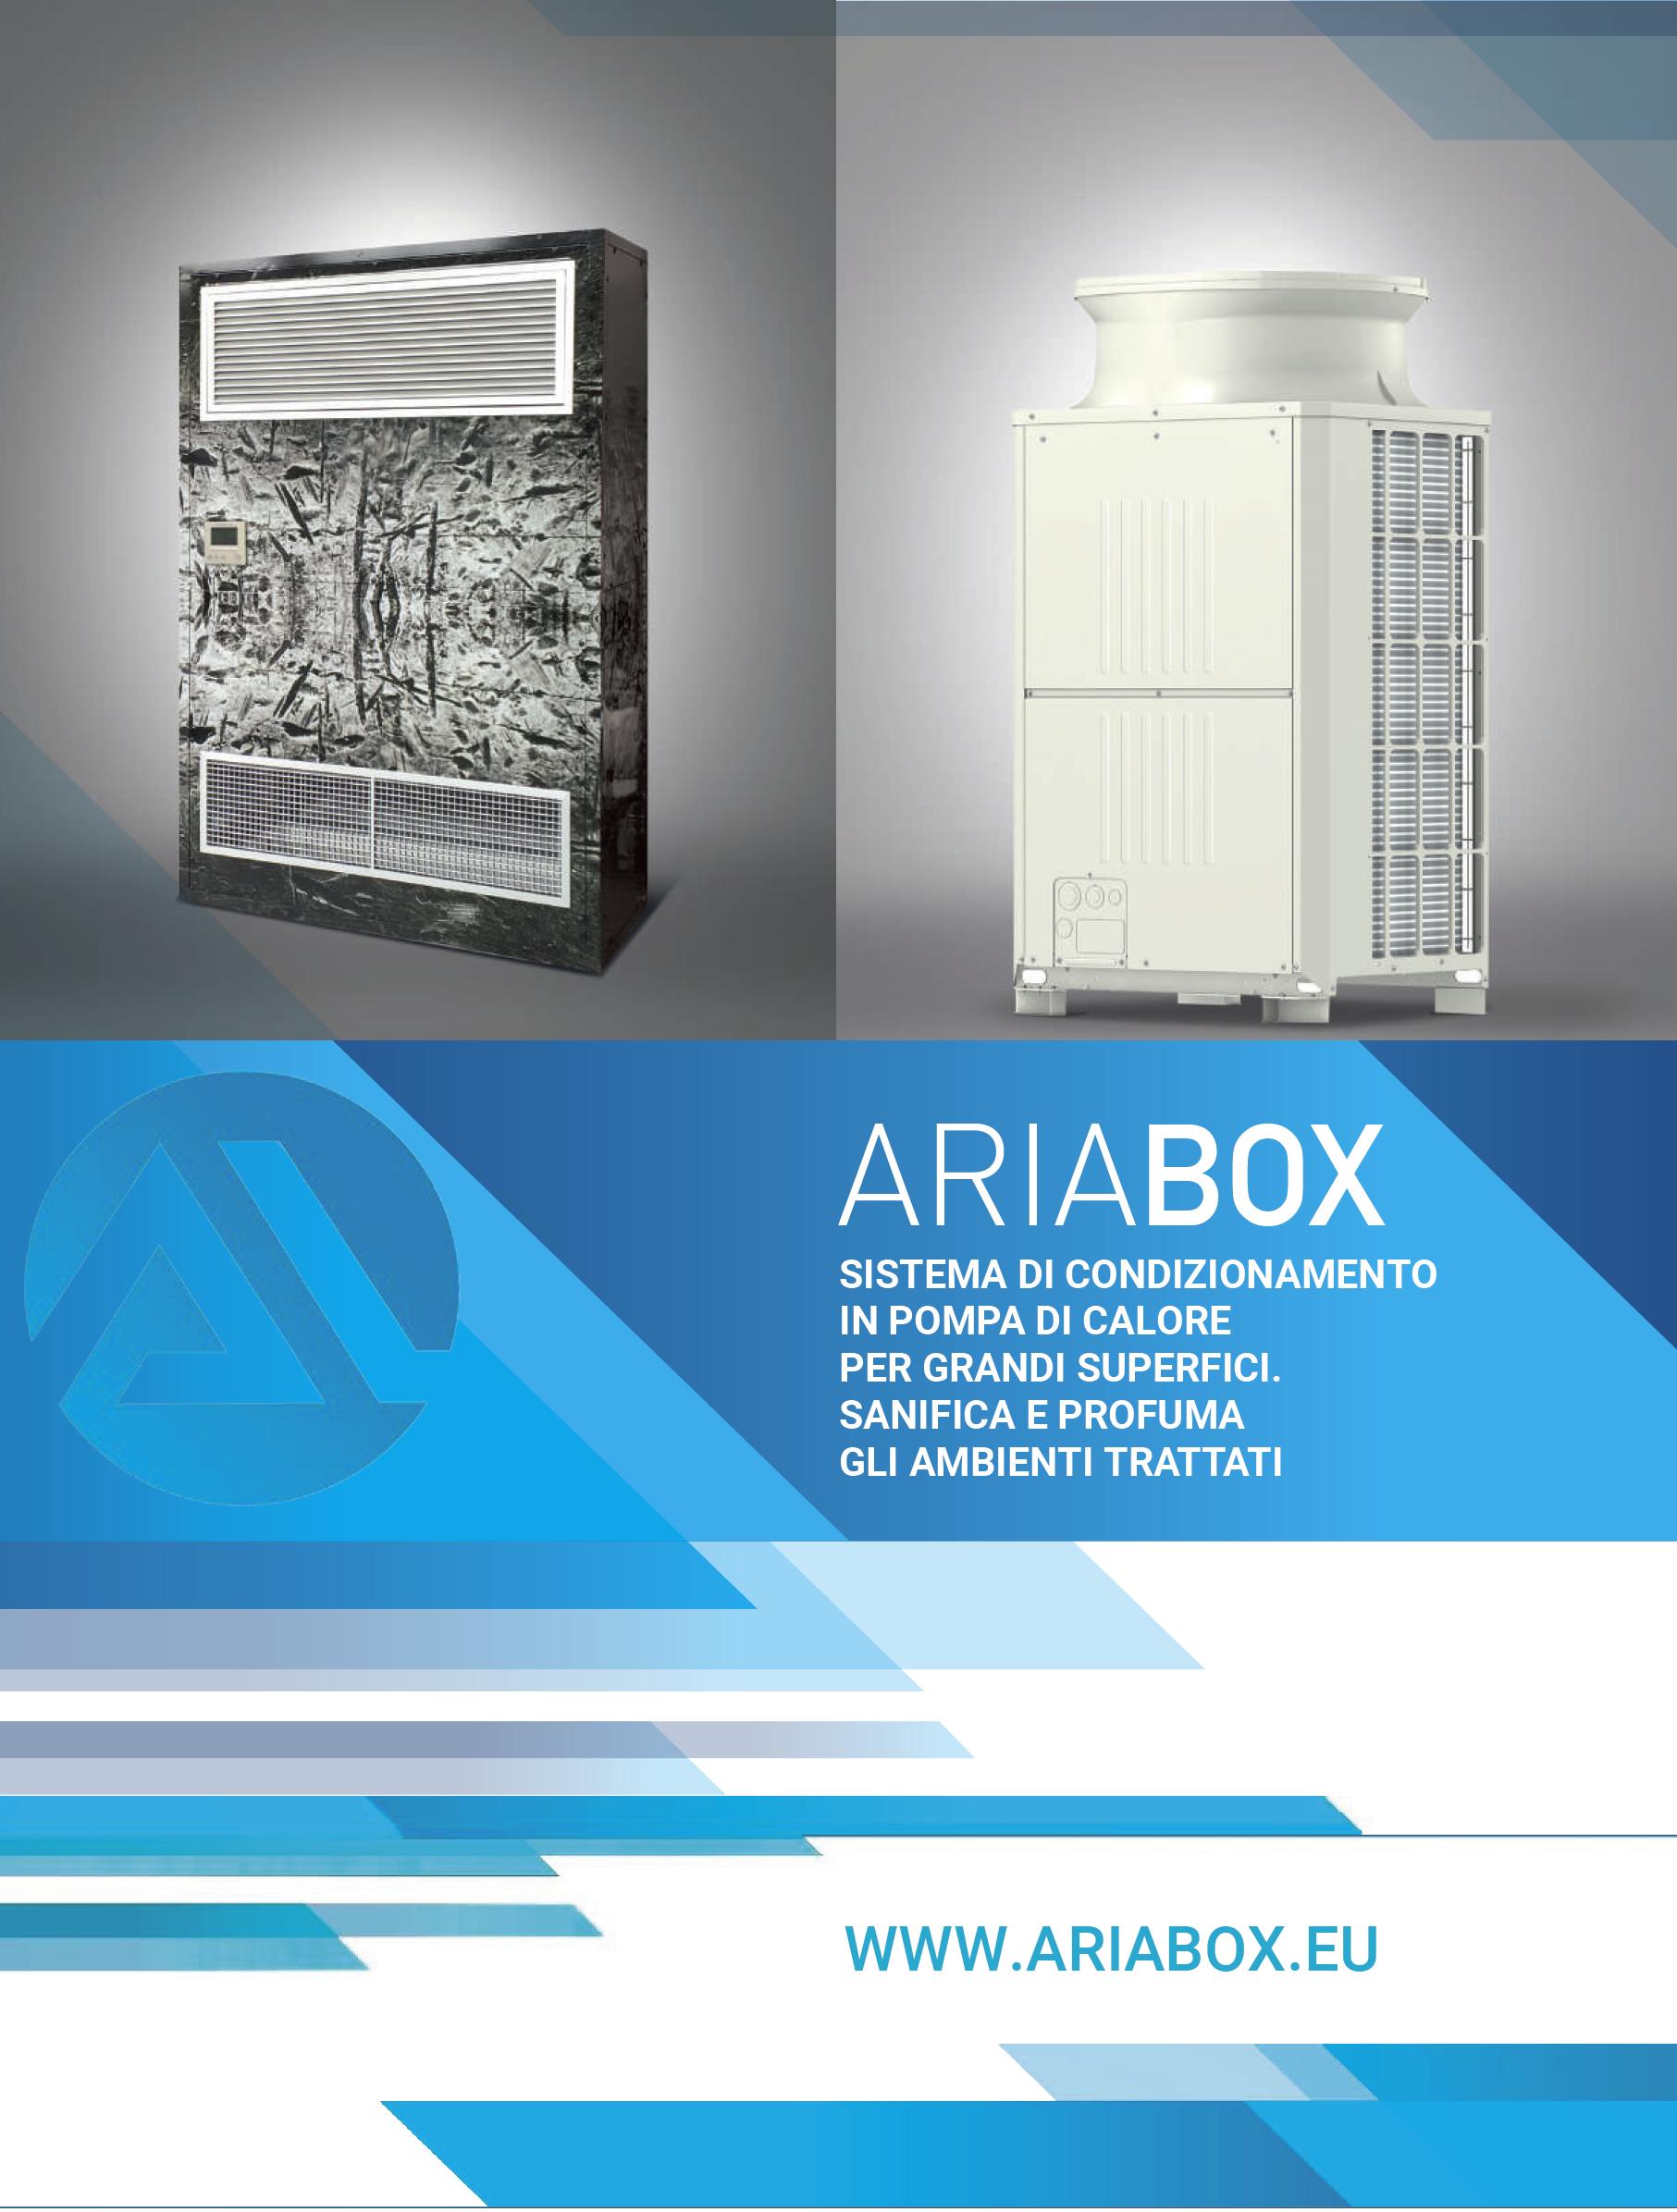 www.ariabox.eu